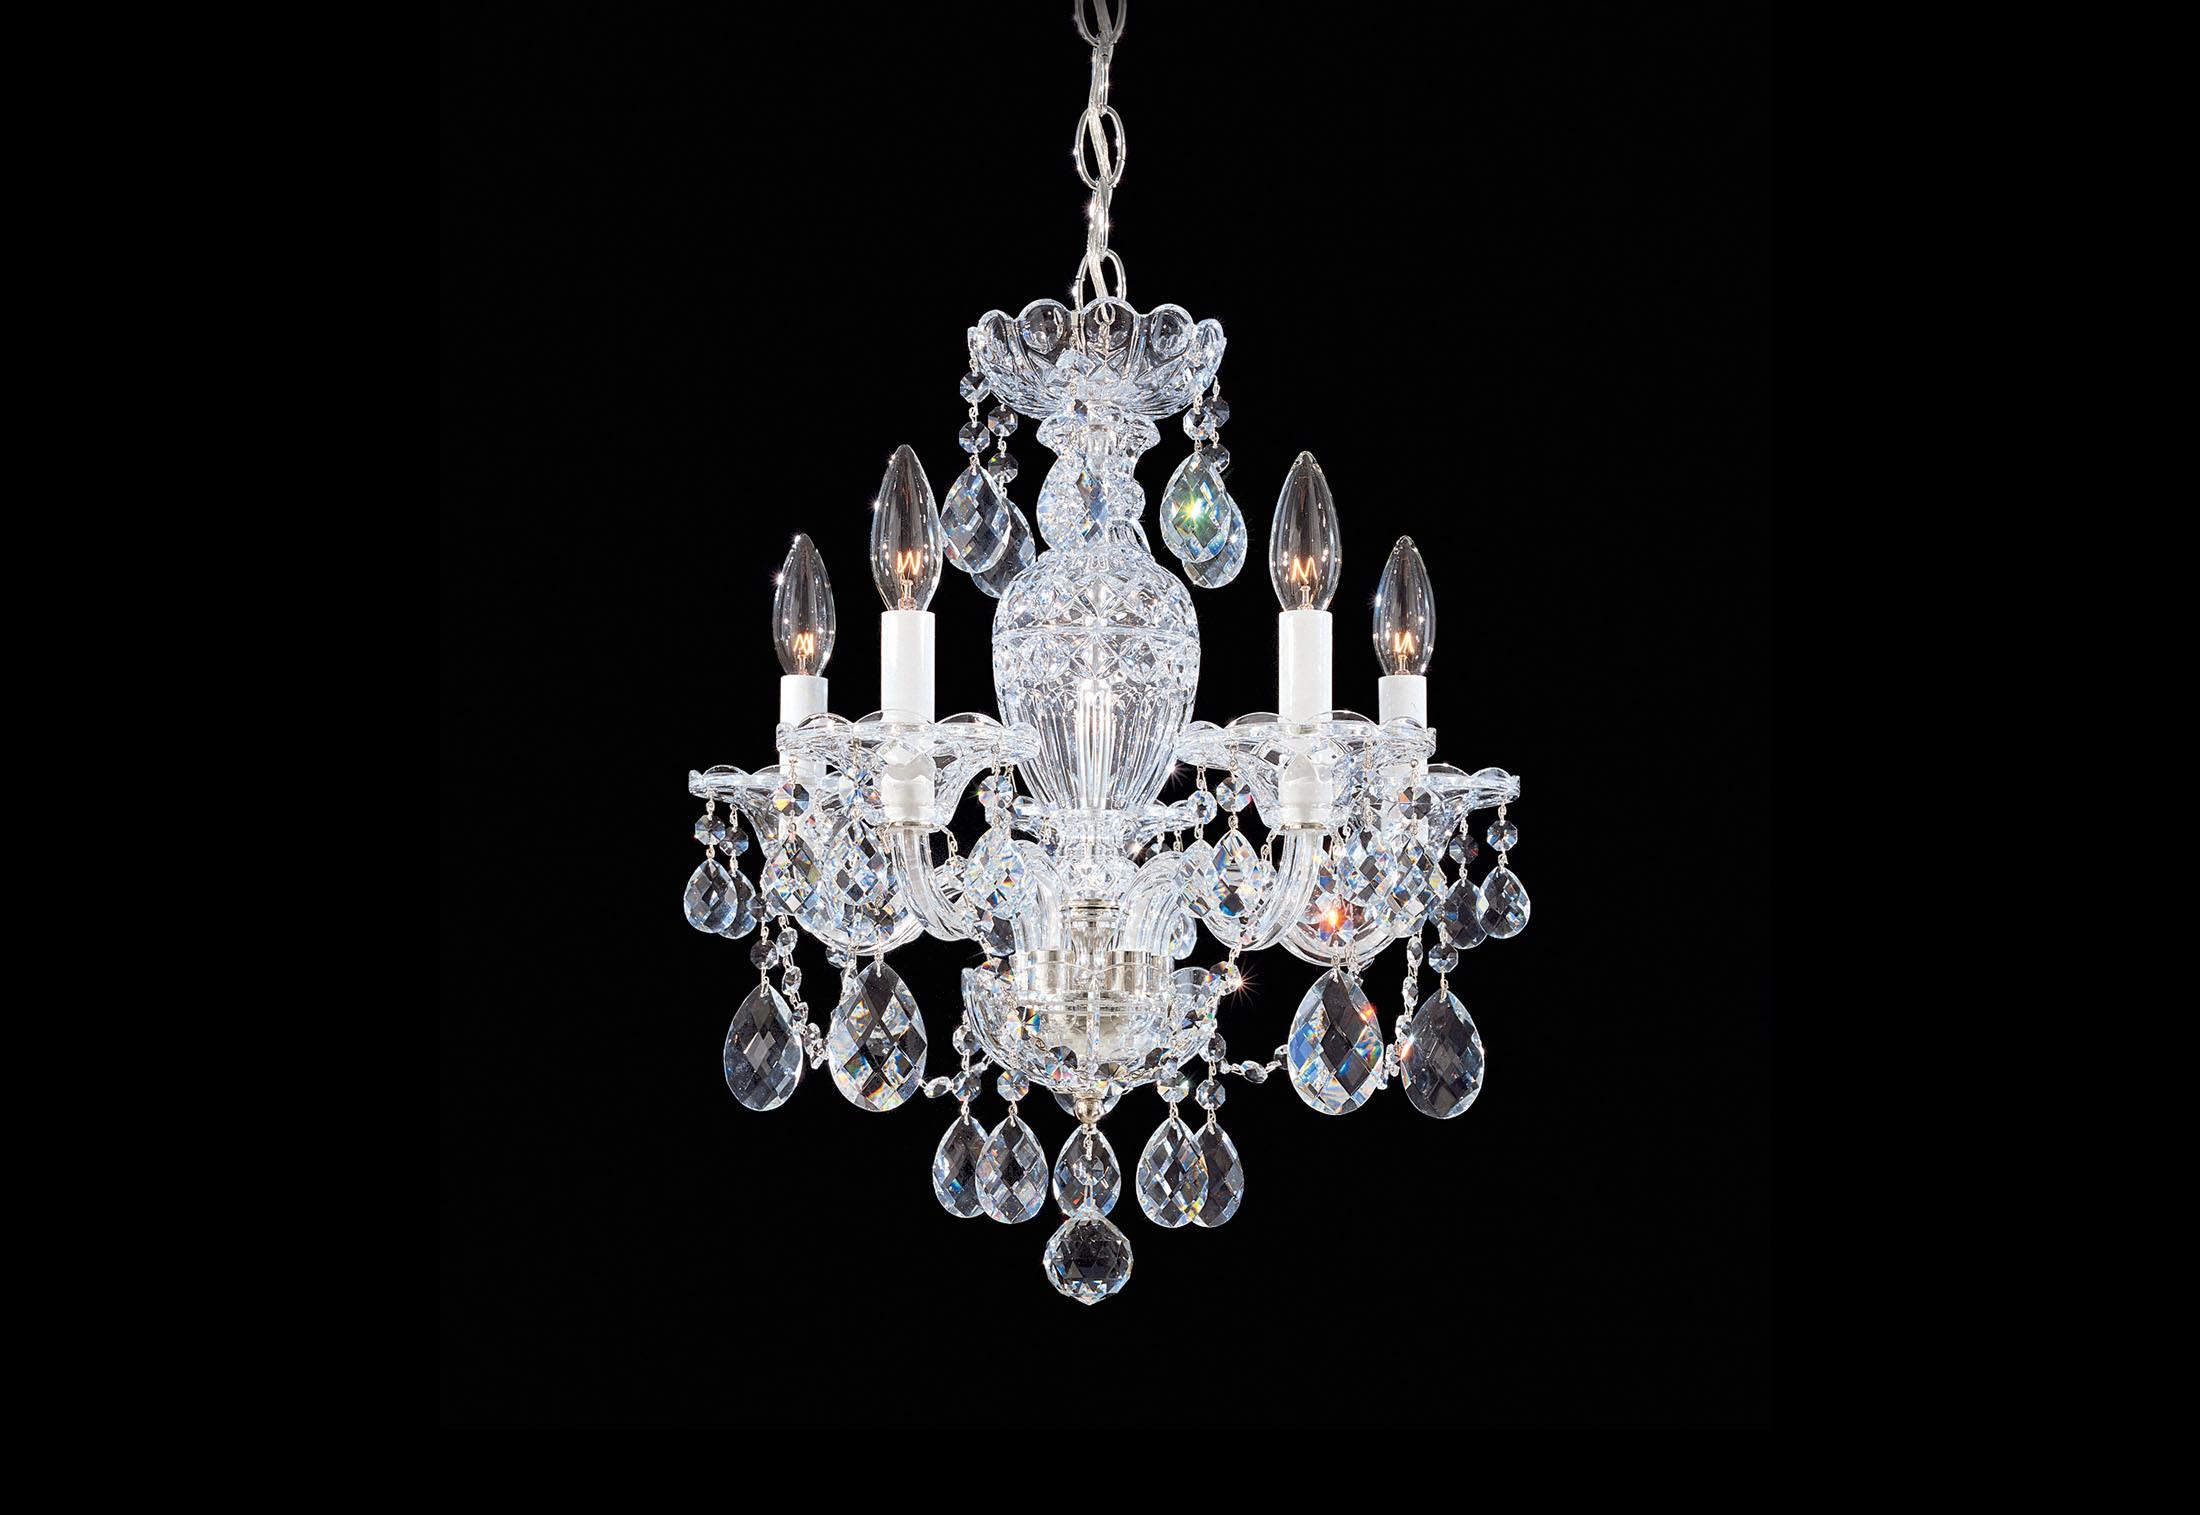 8d3020955d STERLING chandelier by Swarovski Lighting | STYLEPARK